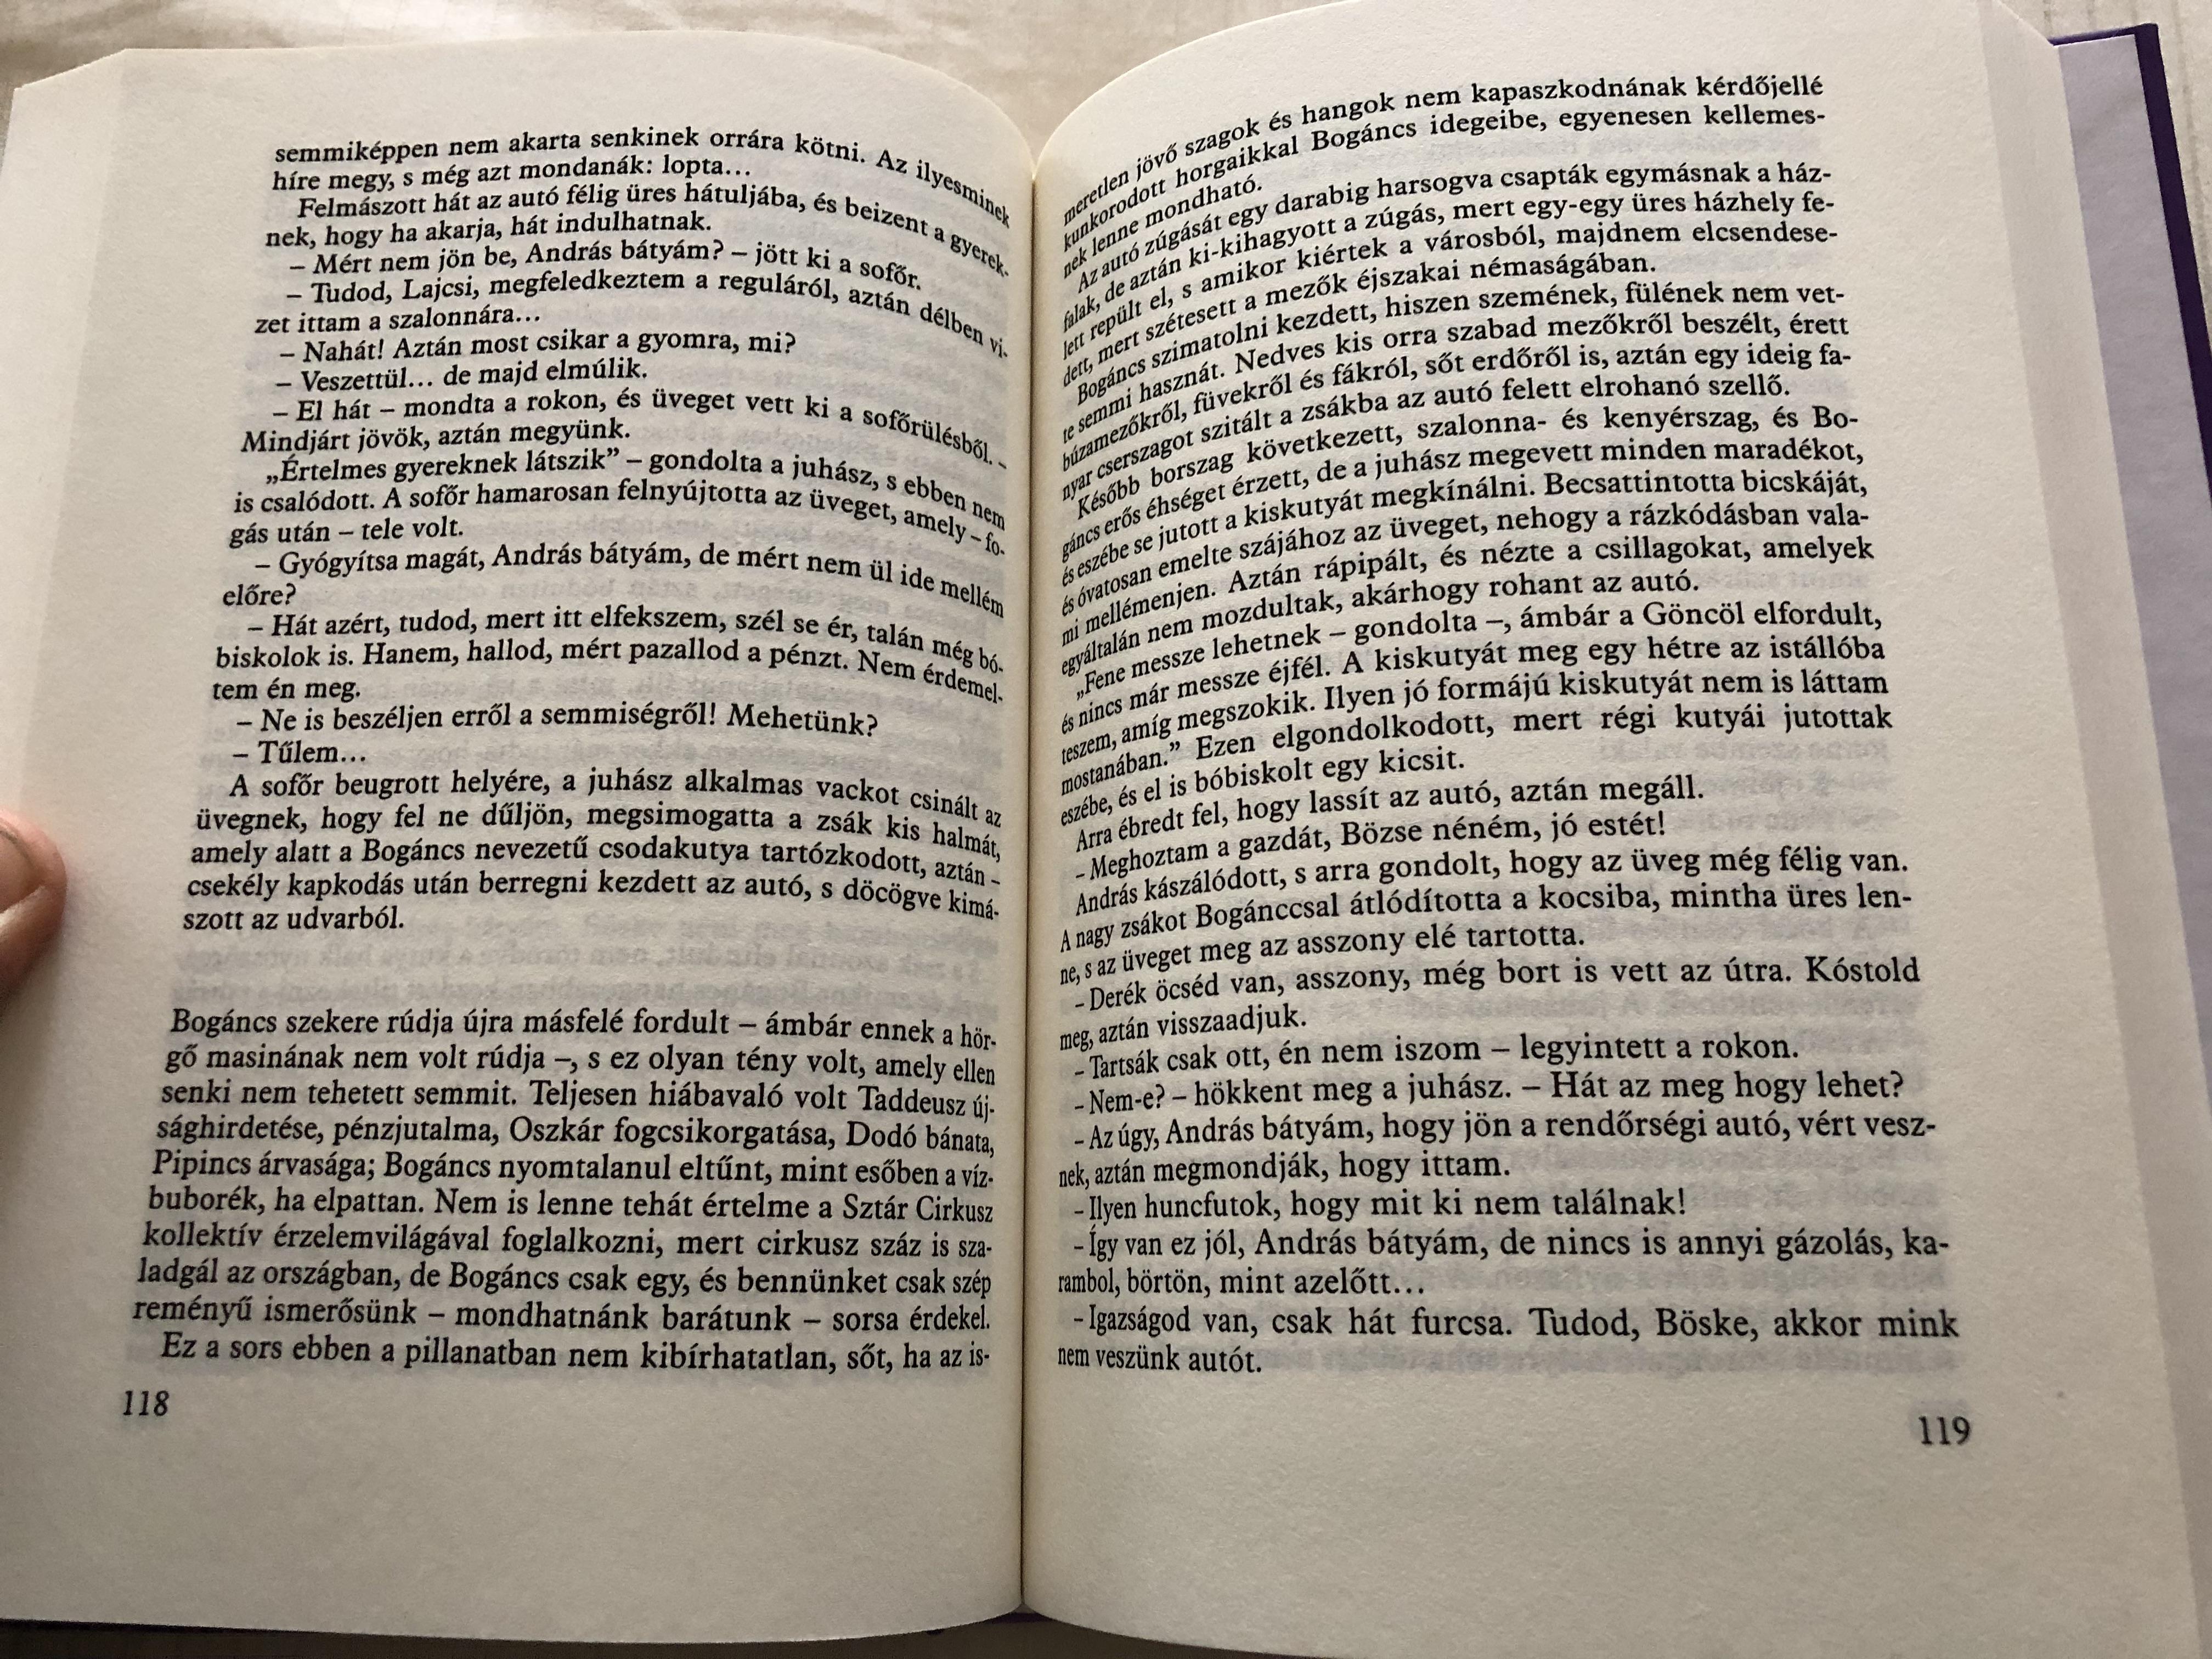 bog-ncs-by-fekete-istv-n-m-ra-k-nyvkiad-2015-hardcover-hungarian-literary-classic-5-.jpg